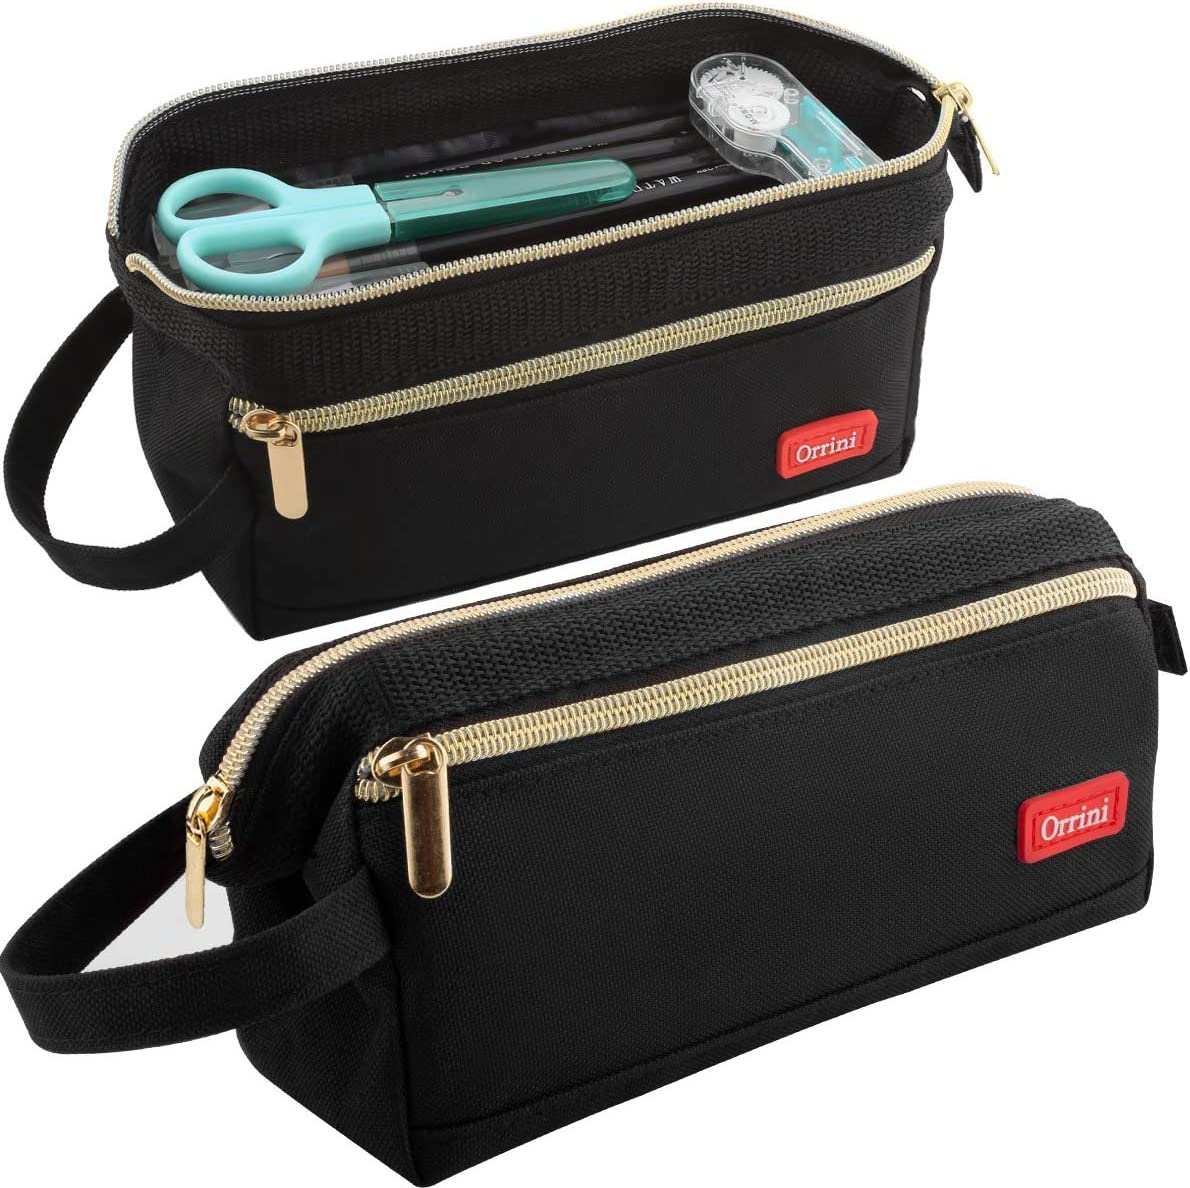 Orrini Pencil Case Pen Case Pencil Bag Organizer Holder,Makeup Pouch for School Office Teen Boys Girls Students Adults (Black)